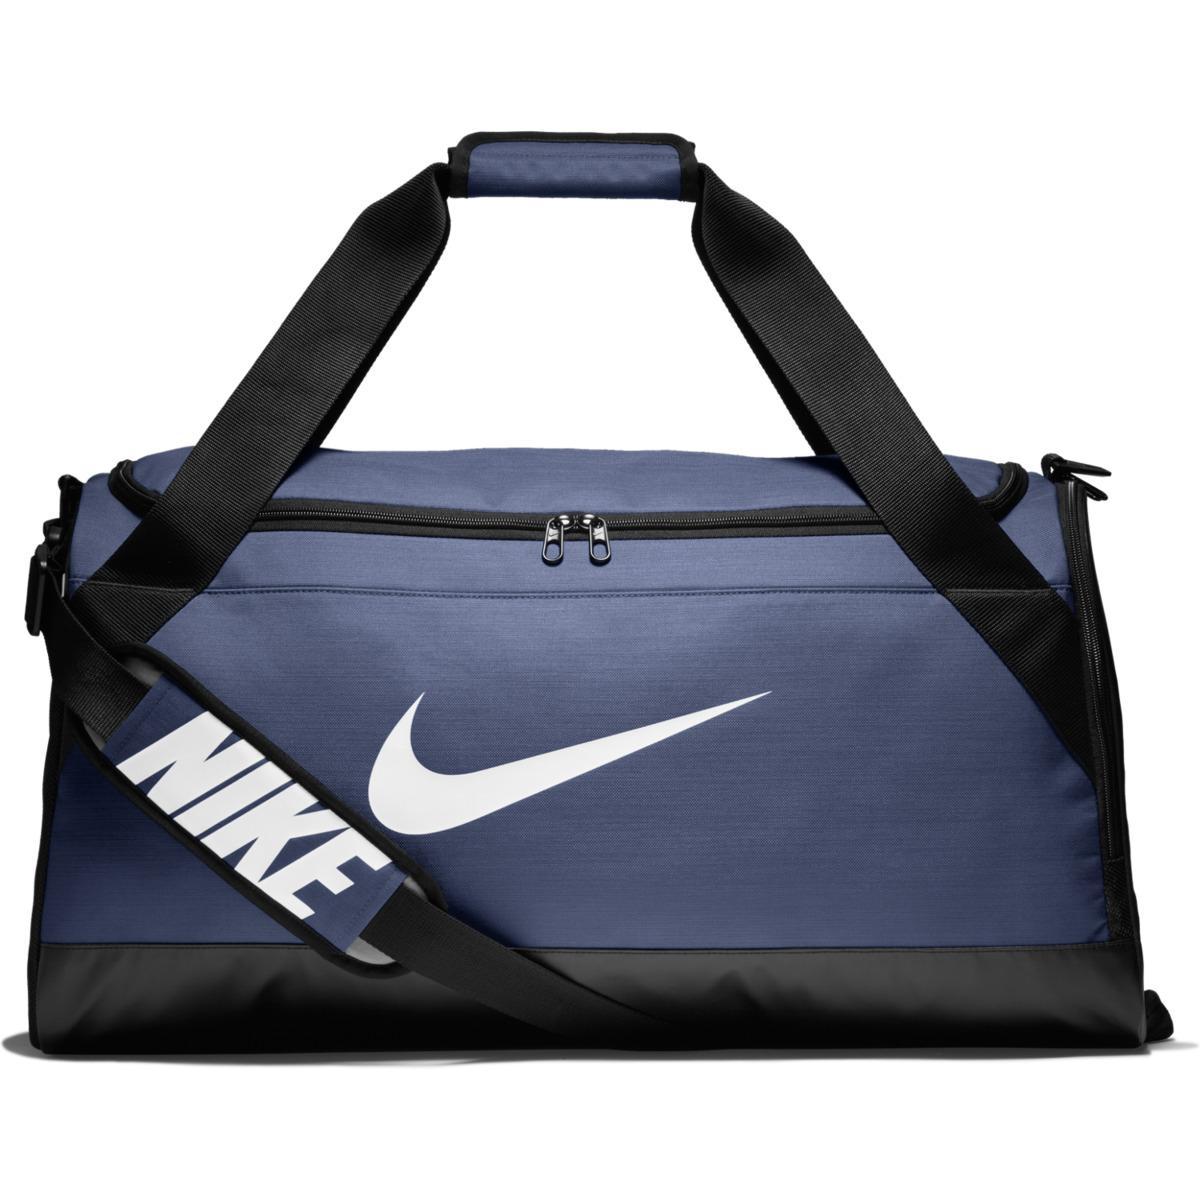 43d1b24126ce Lyst - Nike Brasilia M Training Duffel Sports Bag in Blue for Men